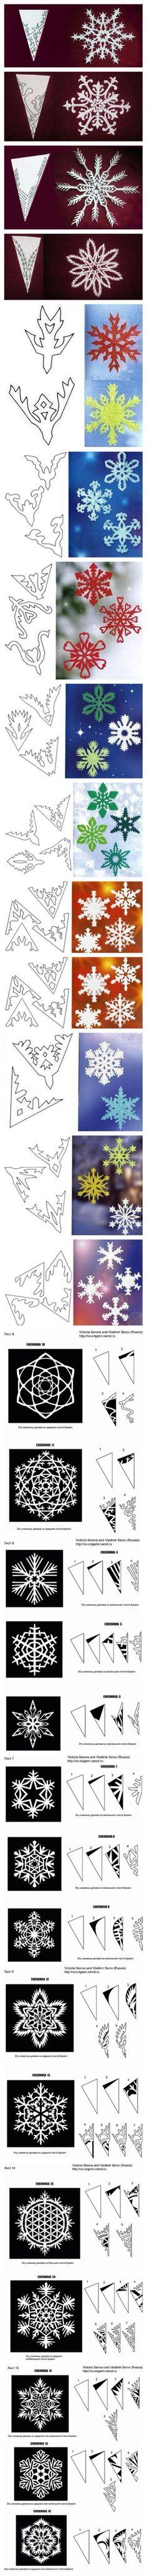 best noel images on pinterest christmas crafts christmas